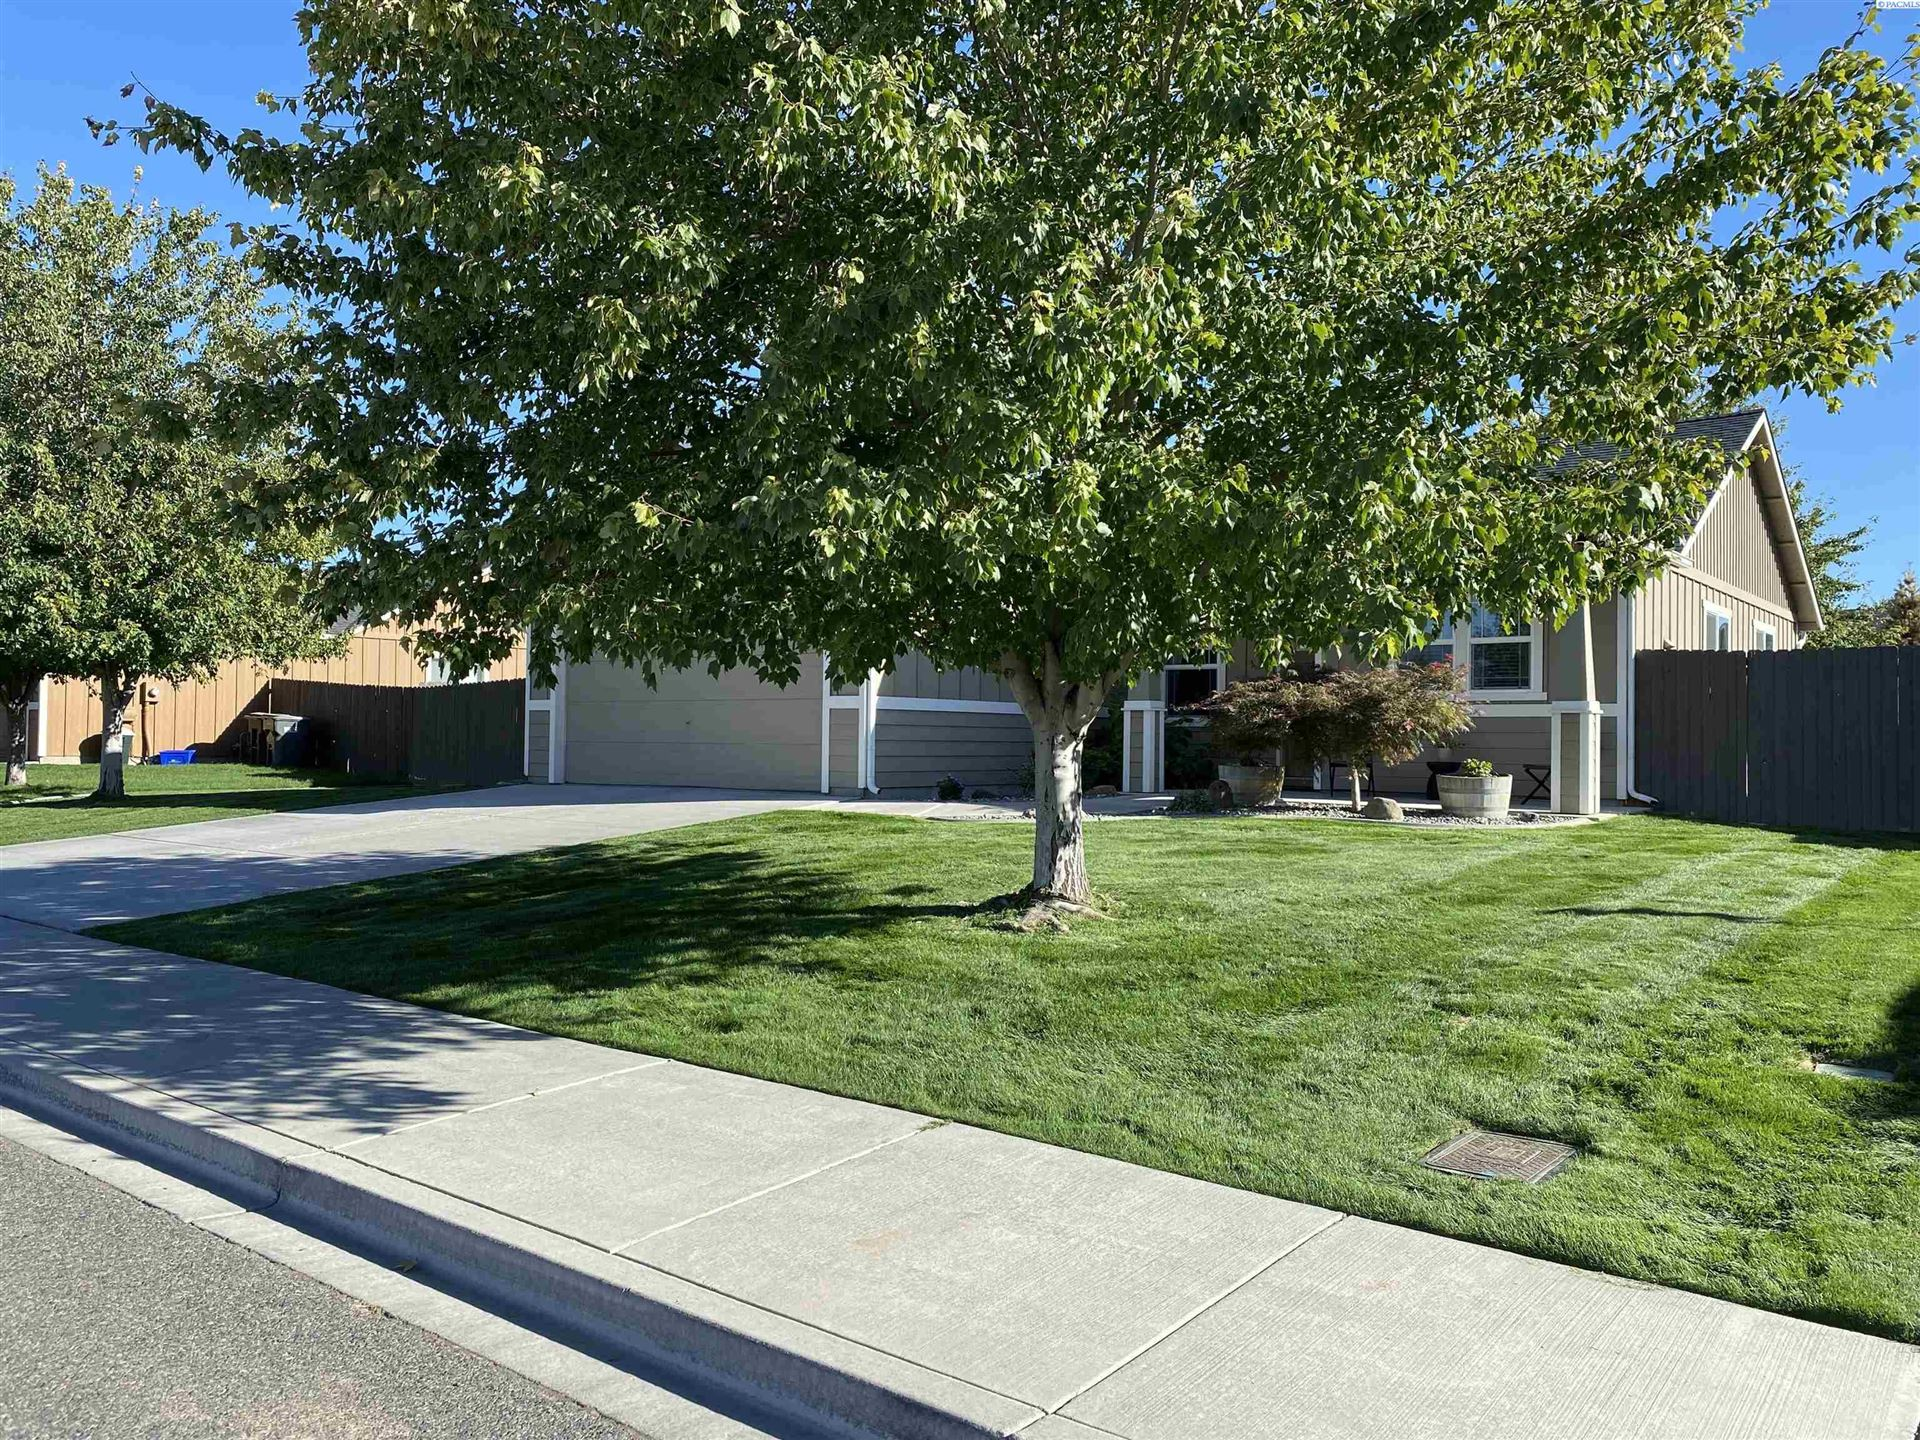 Photo of 6607 W 5th Ave, Kennewick, WA 99336 (MLS # 256609)